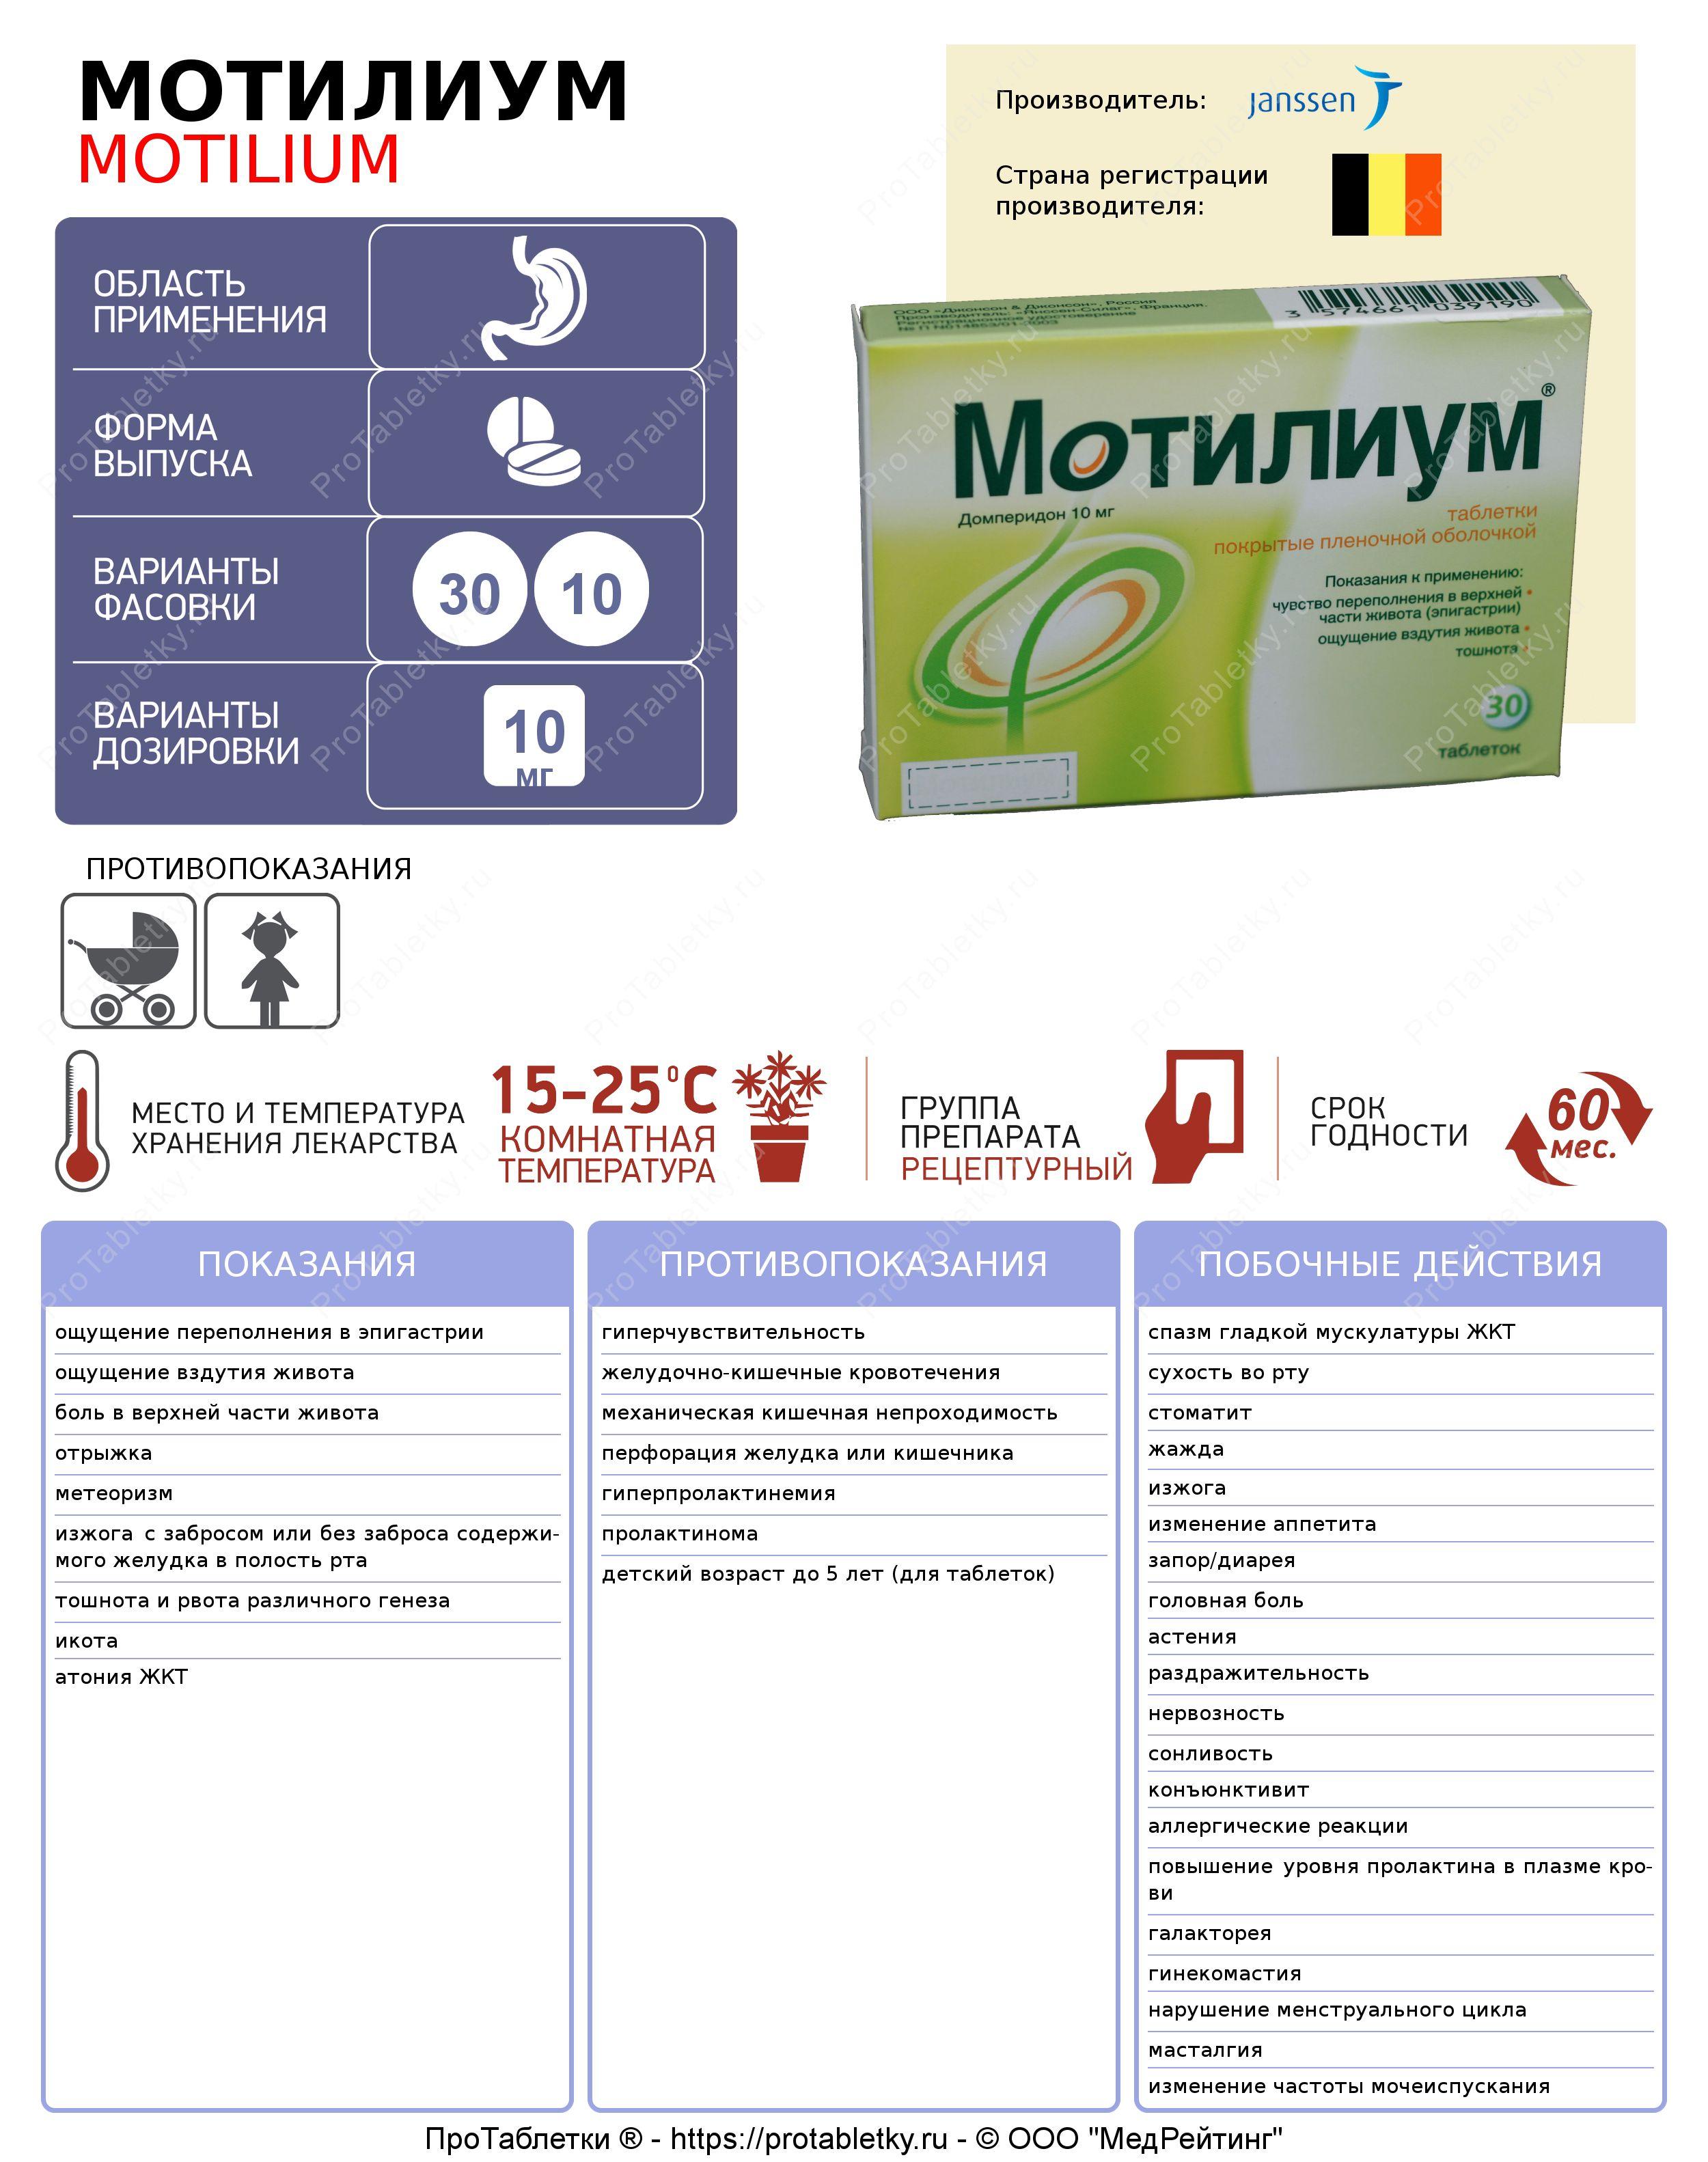 нефазодон инструкция таблетки